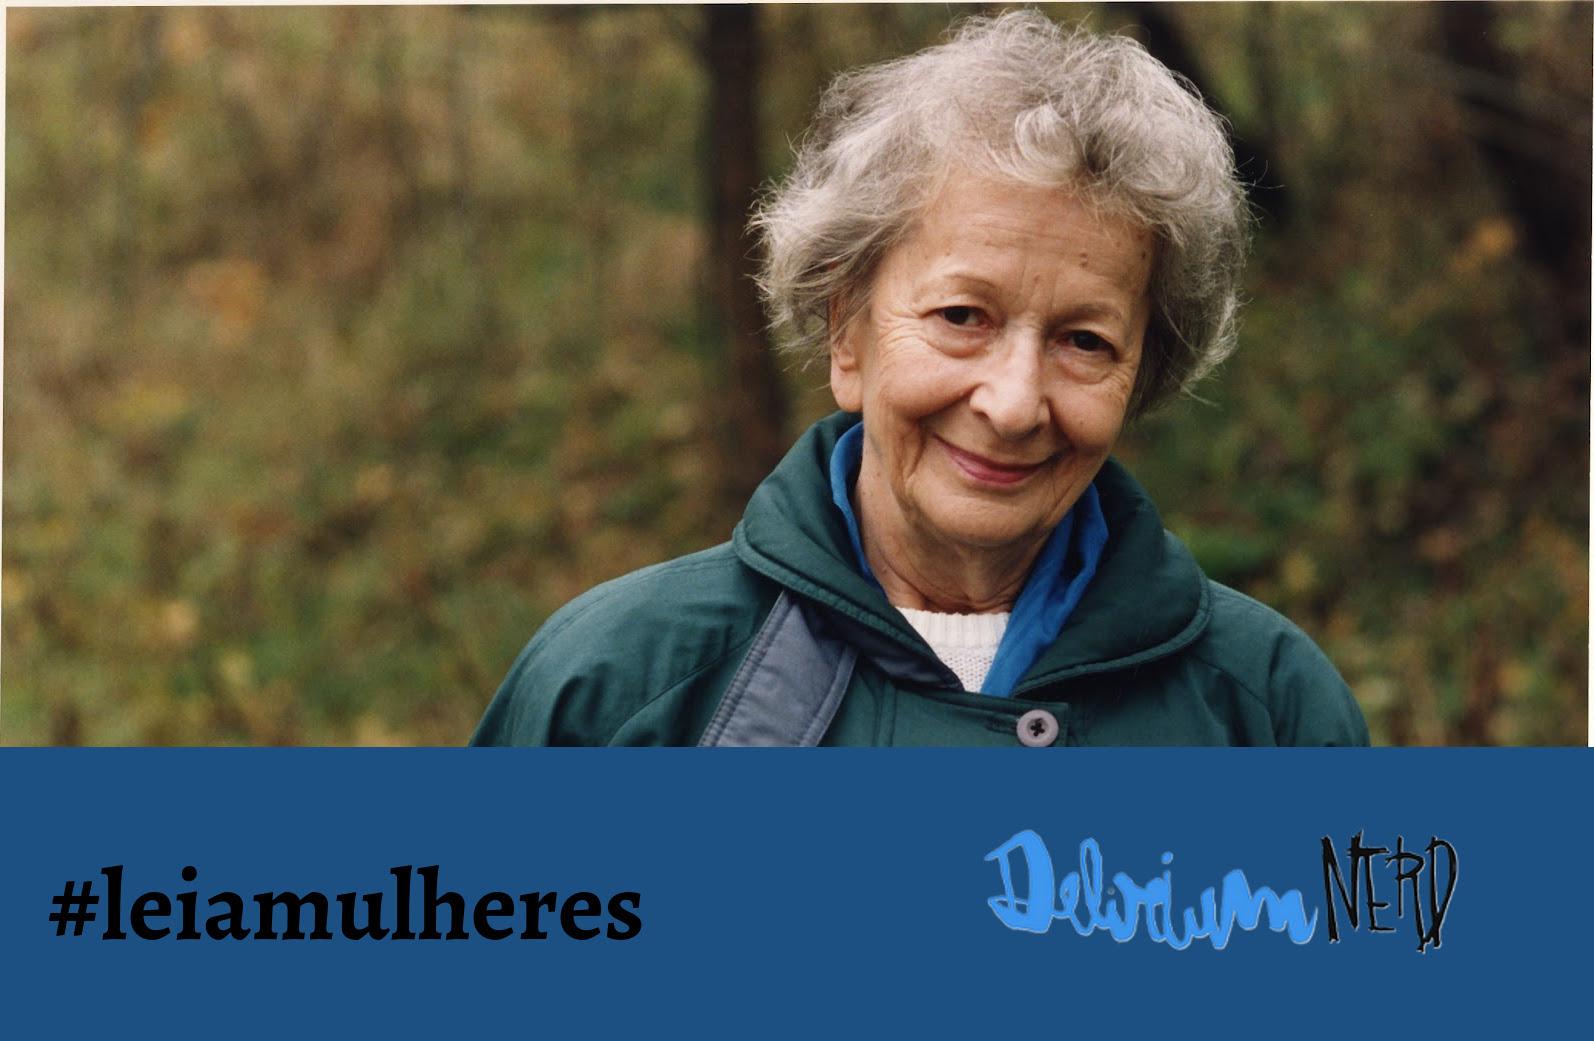 [LIVROS] Leia Mulheres: A Poesia de Wislawa Szymborska